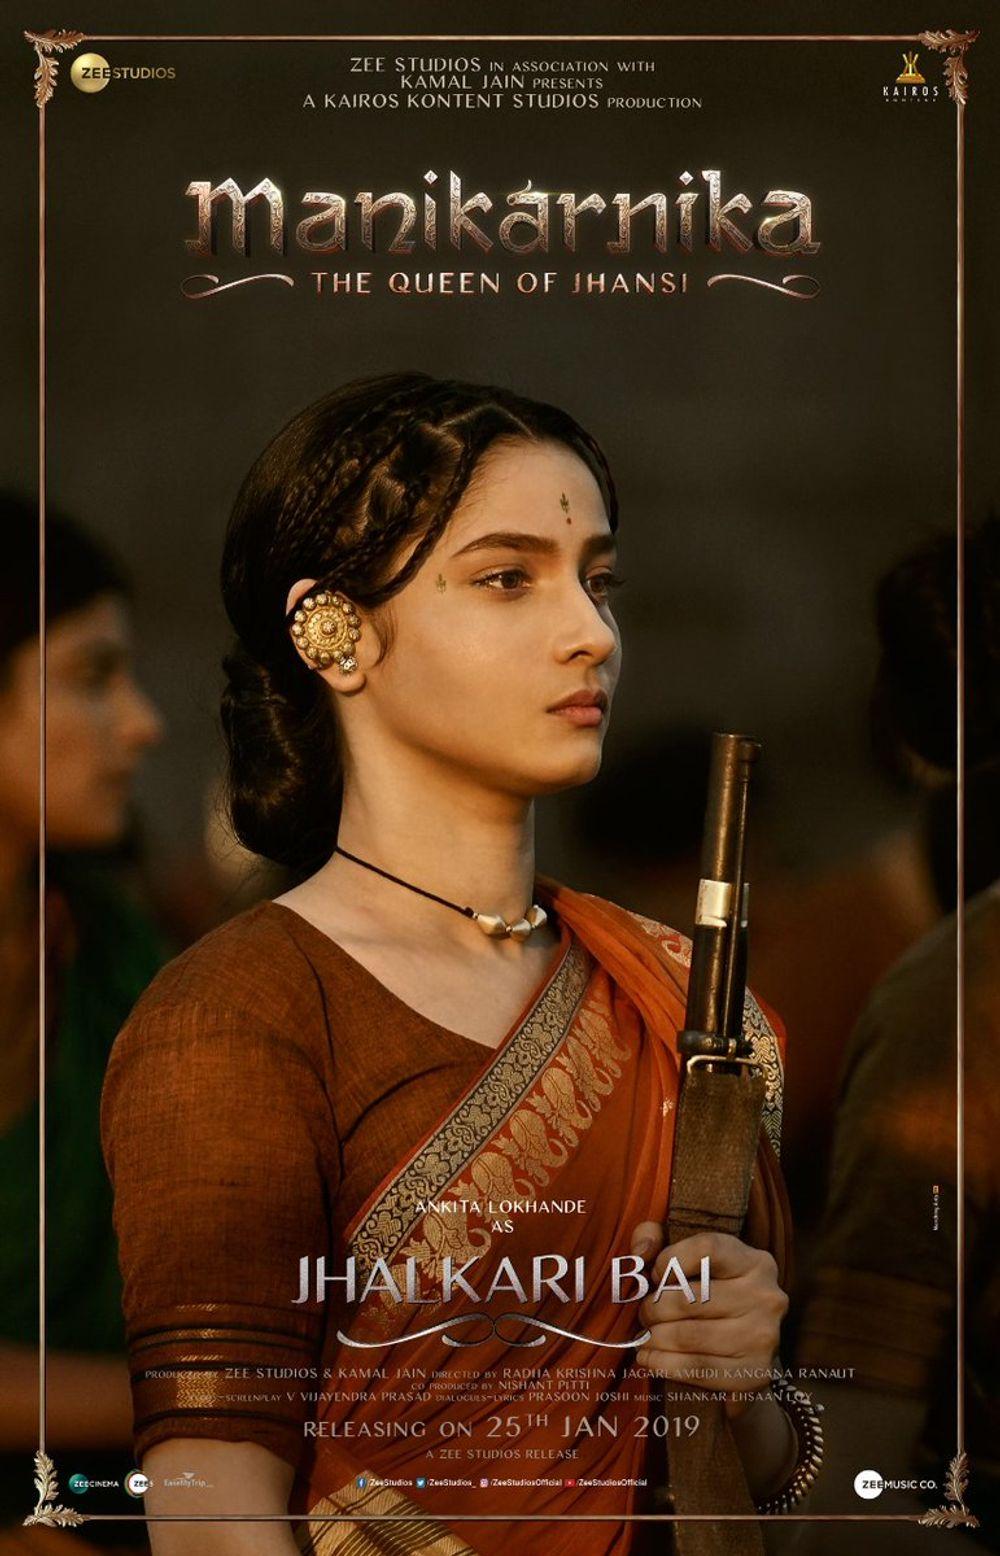 4-Manikarnika - The Queen of Jhansi